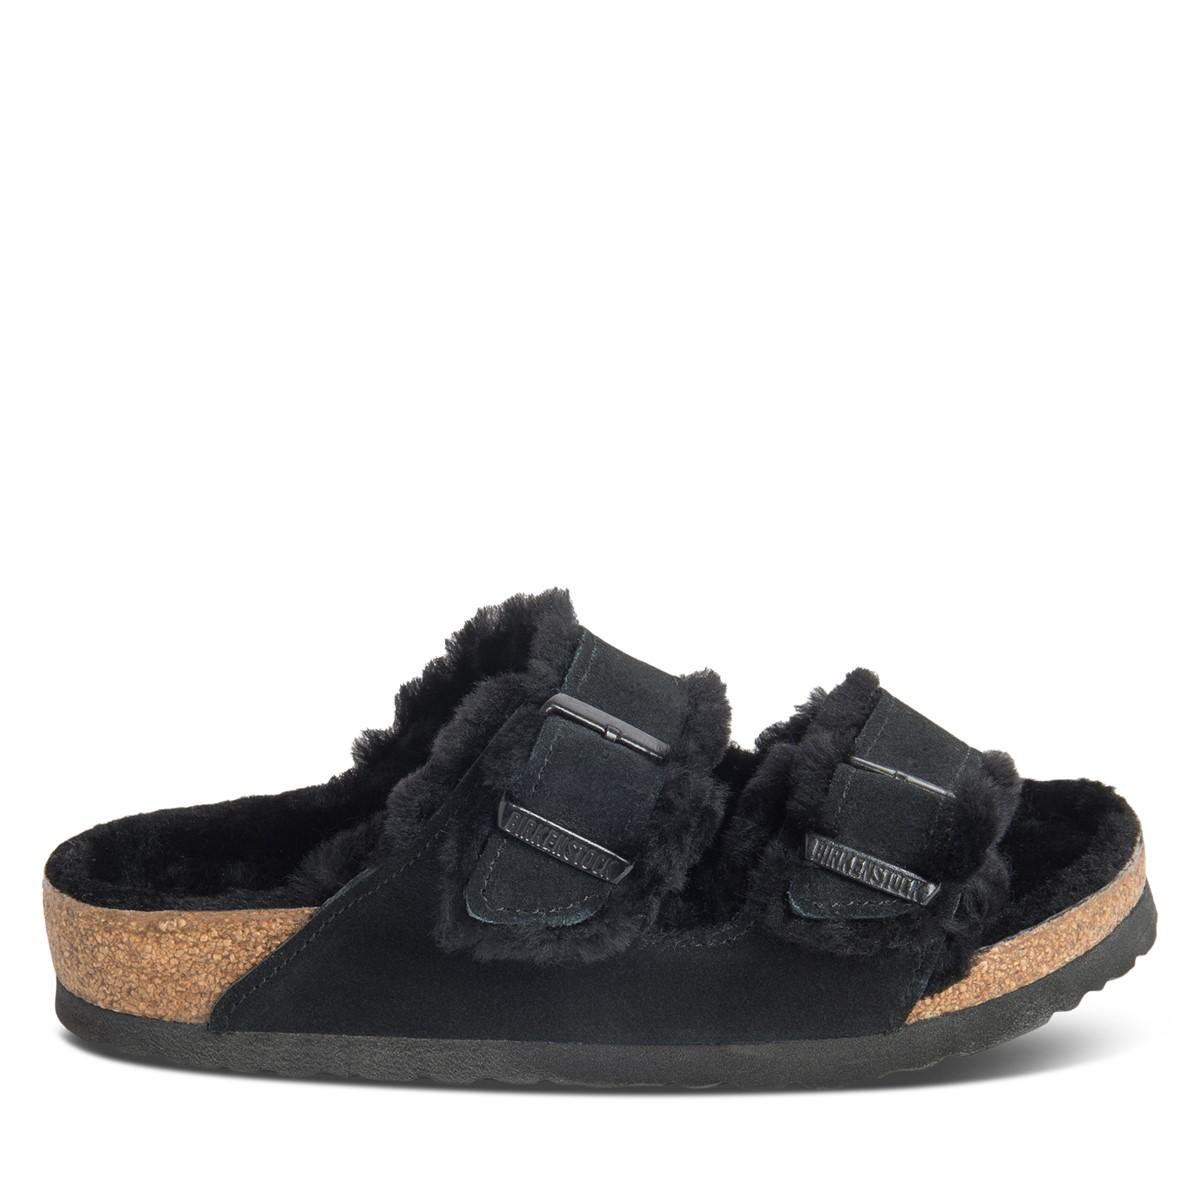 Women's Arizona Shearling Sandals in Black